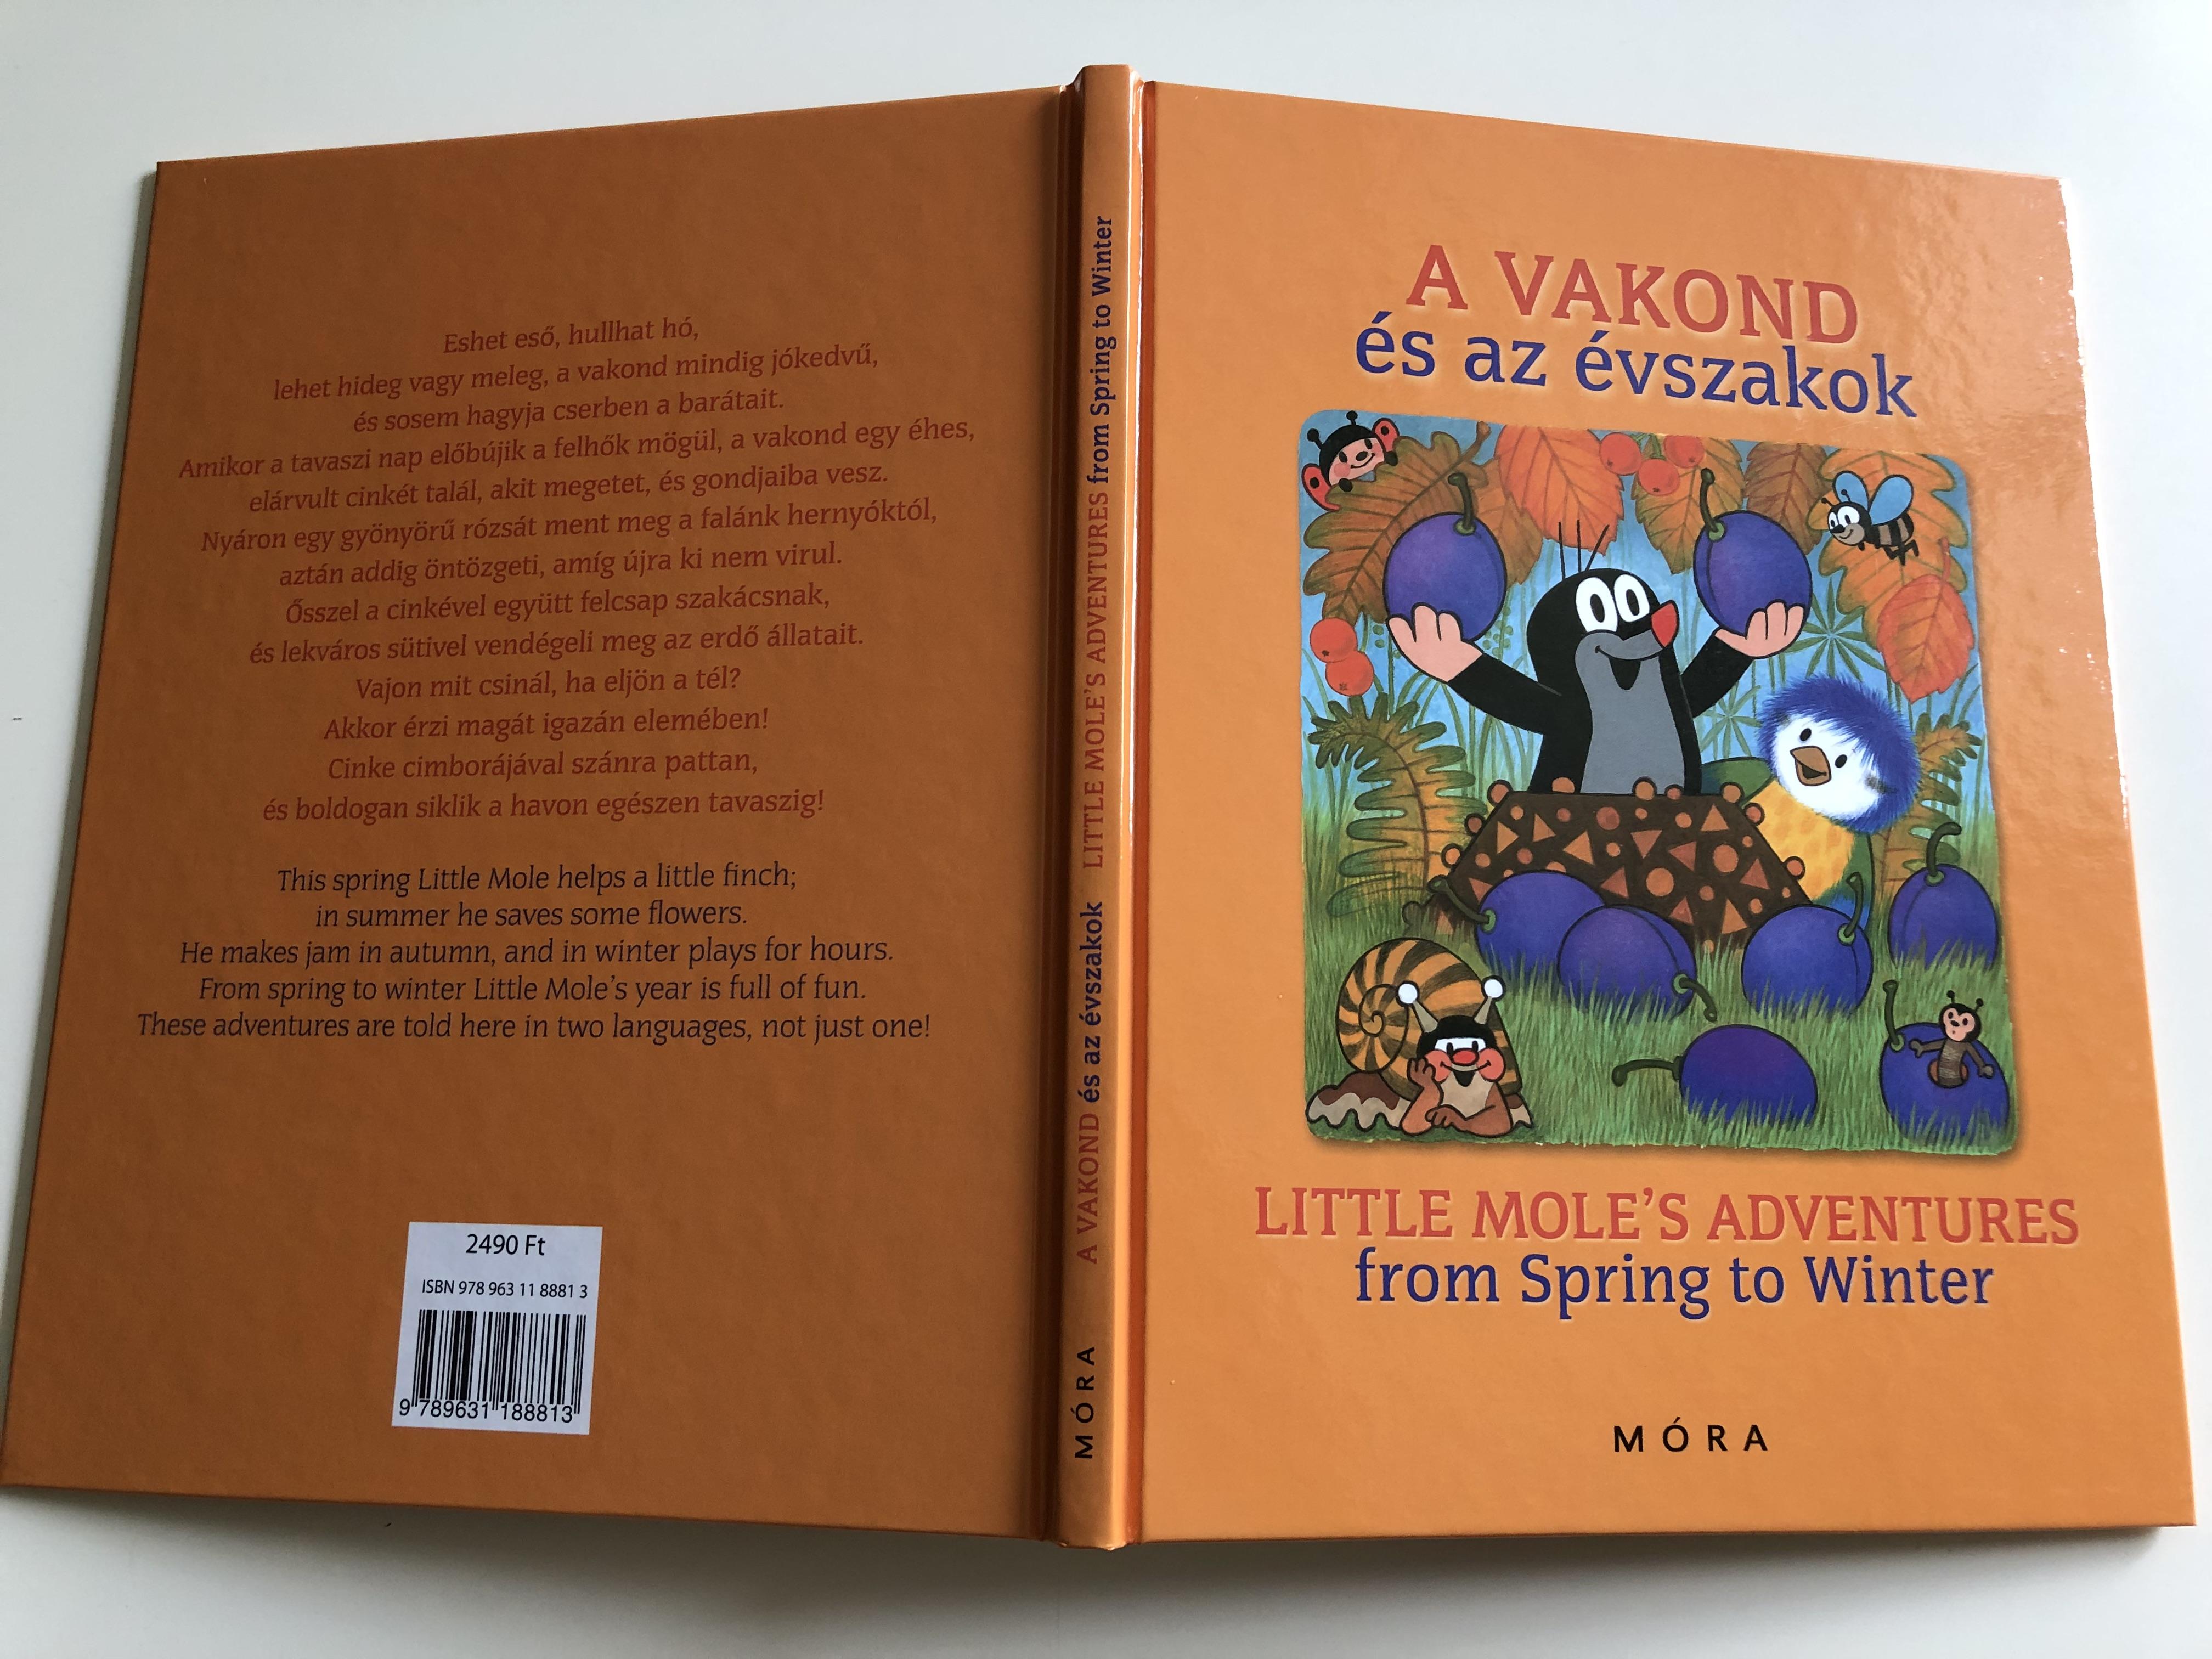 krtek-bilingual-english-hungarian-book-little-mole-s-adventure-from-spring-to-winter-13-.jpg